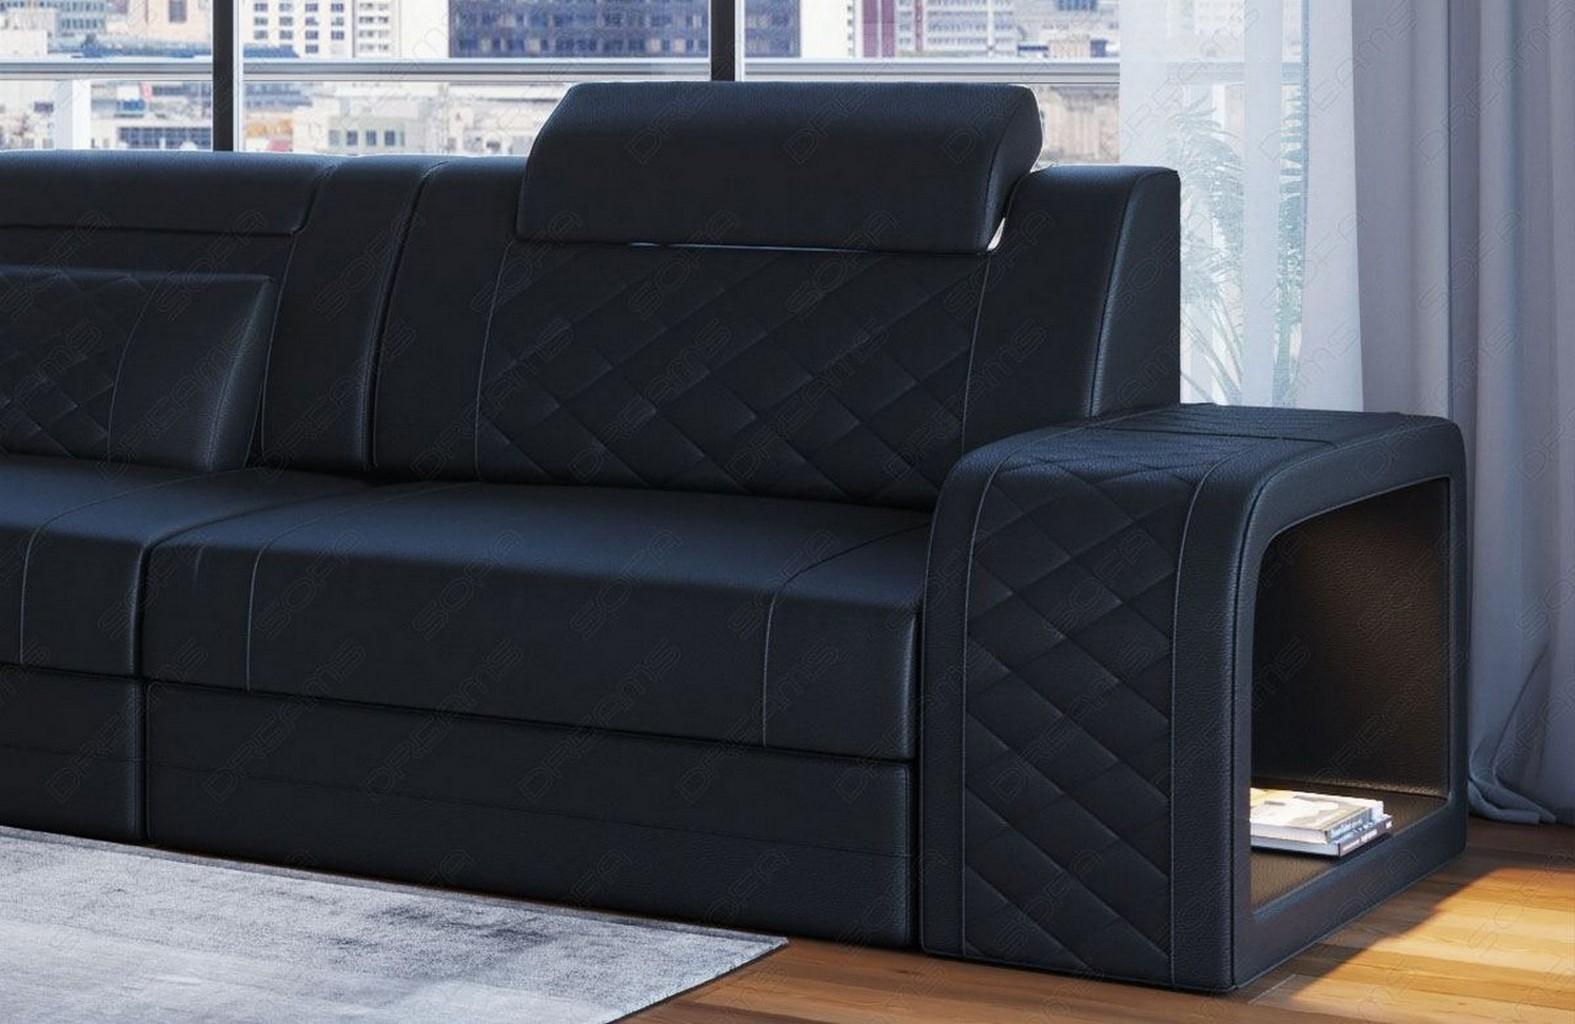 ledersofa eckcouch sofa design luxus couch berlin l form mit led beleuchtung usb ebay. Black Bedroom Furniture Sets. Home Design Ideas